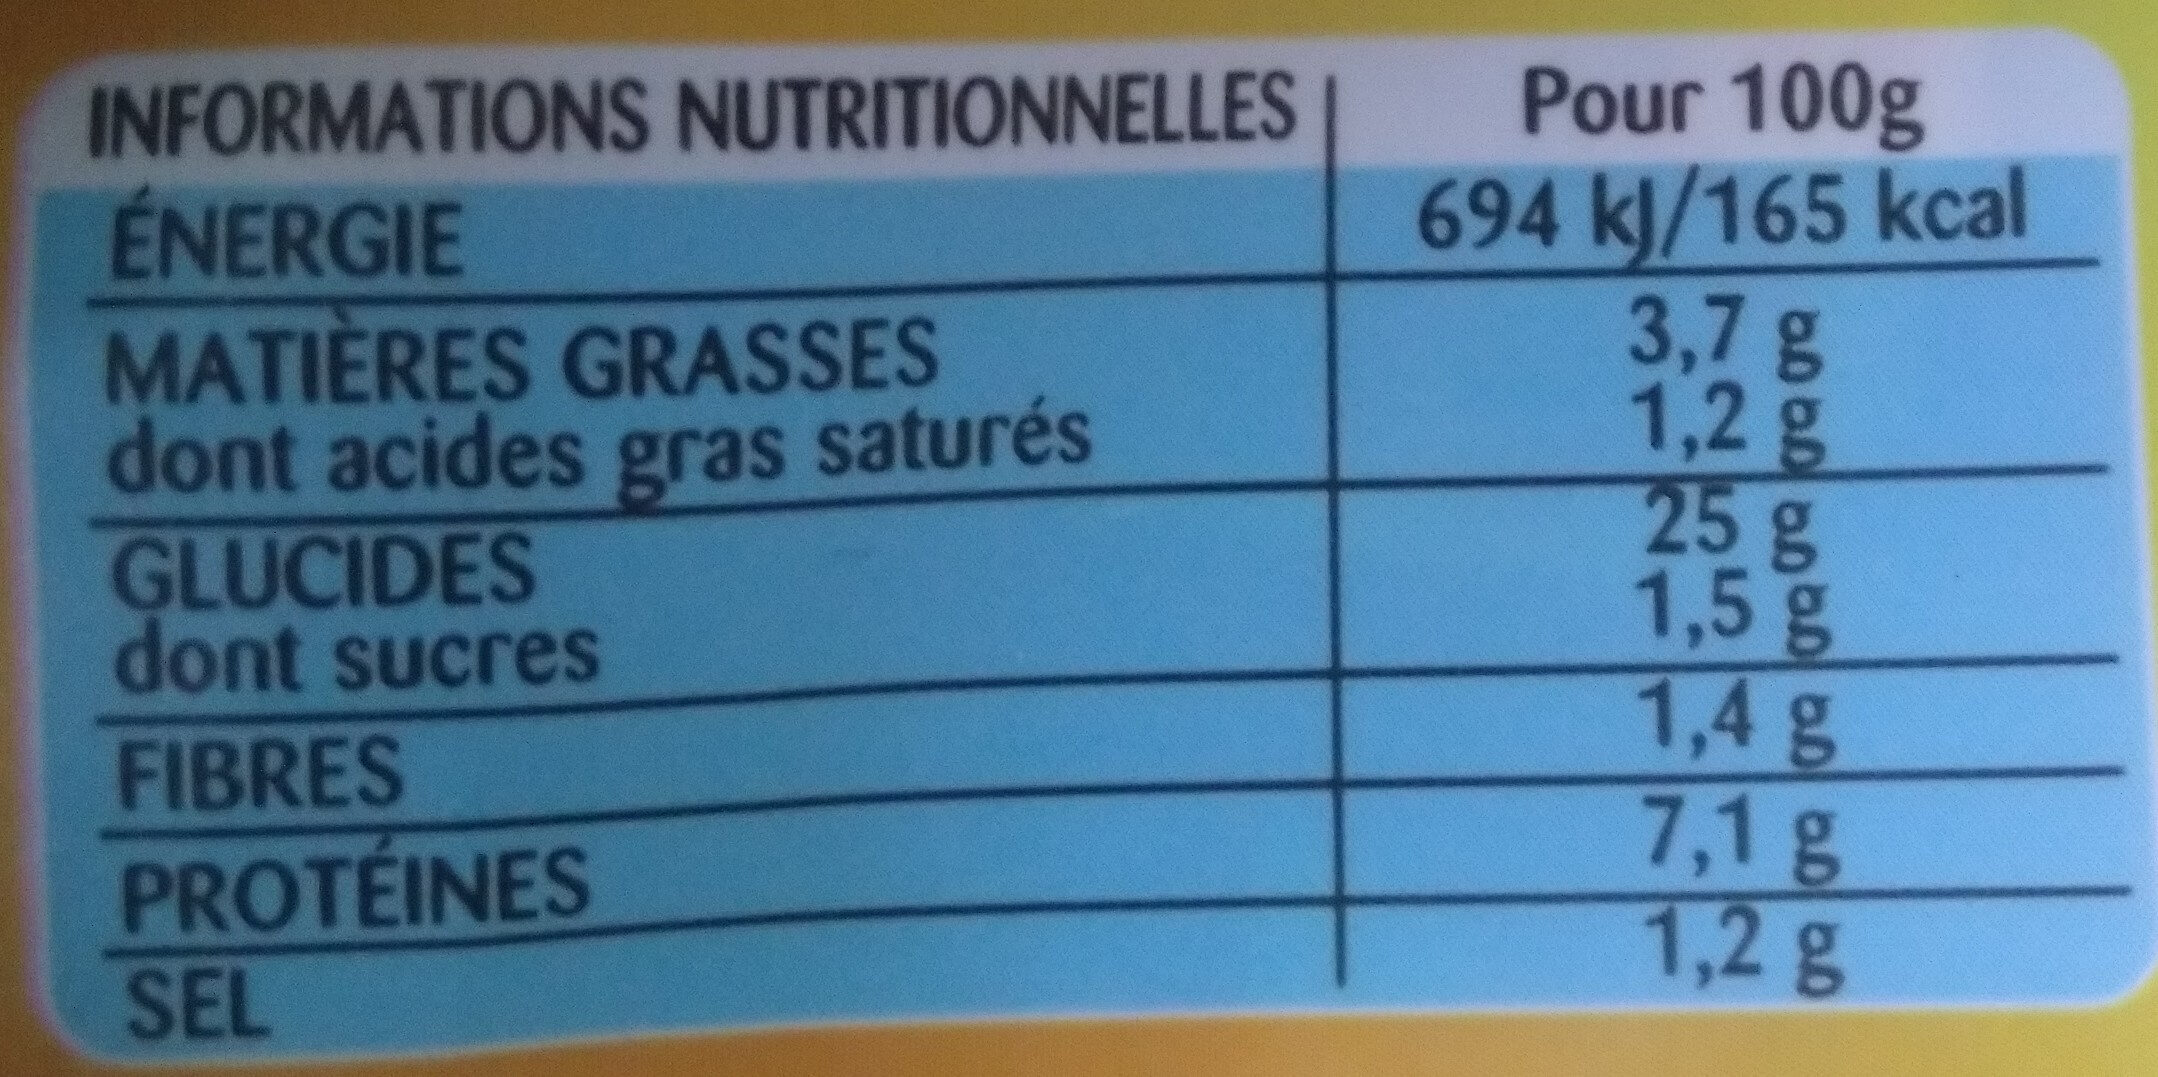 Lustucru selection tortellini a poeler maxi jambon emmental - Informations nutritionnelles - fr